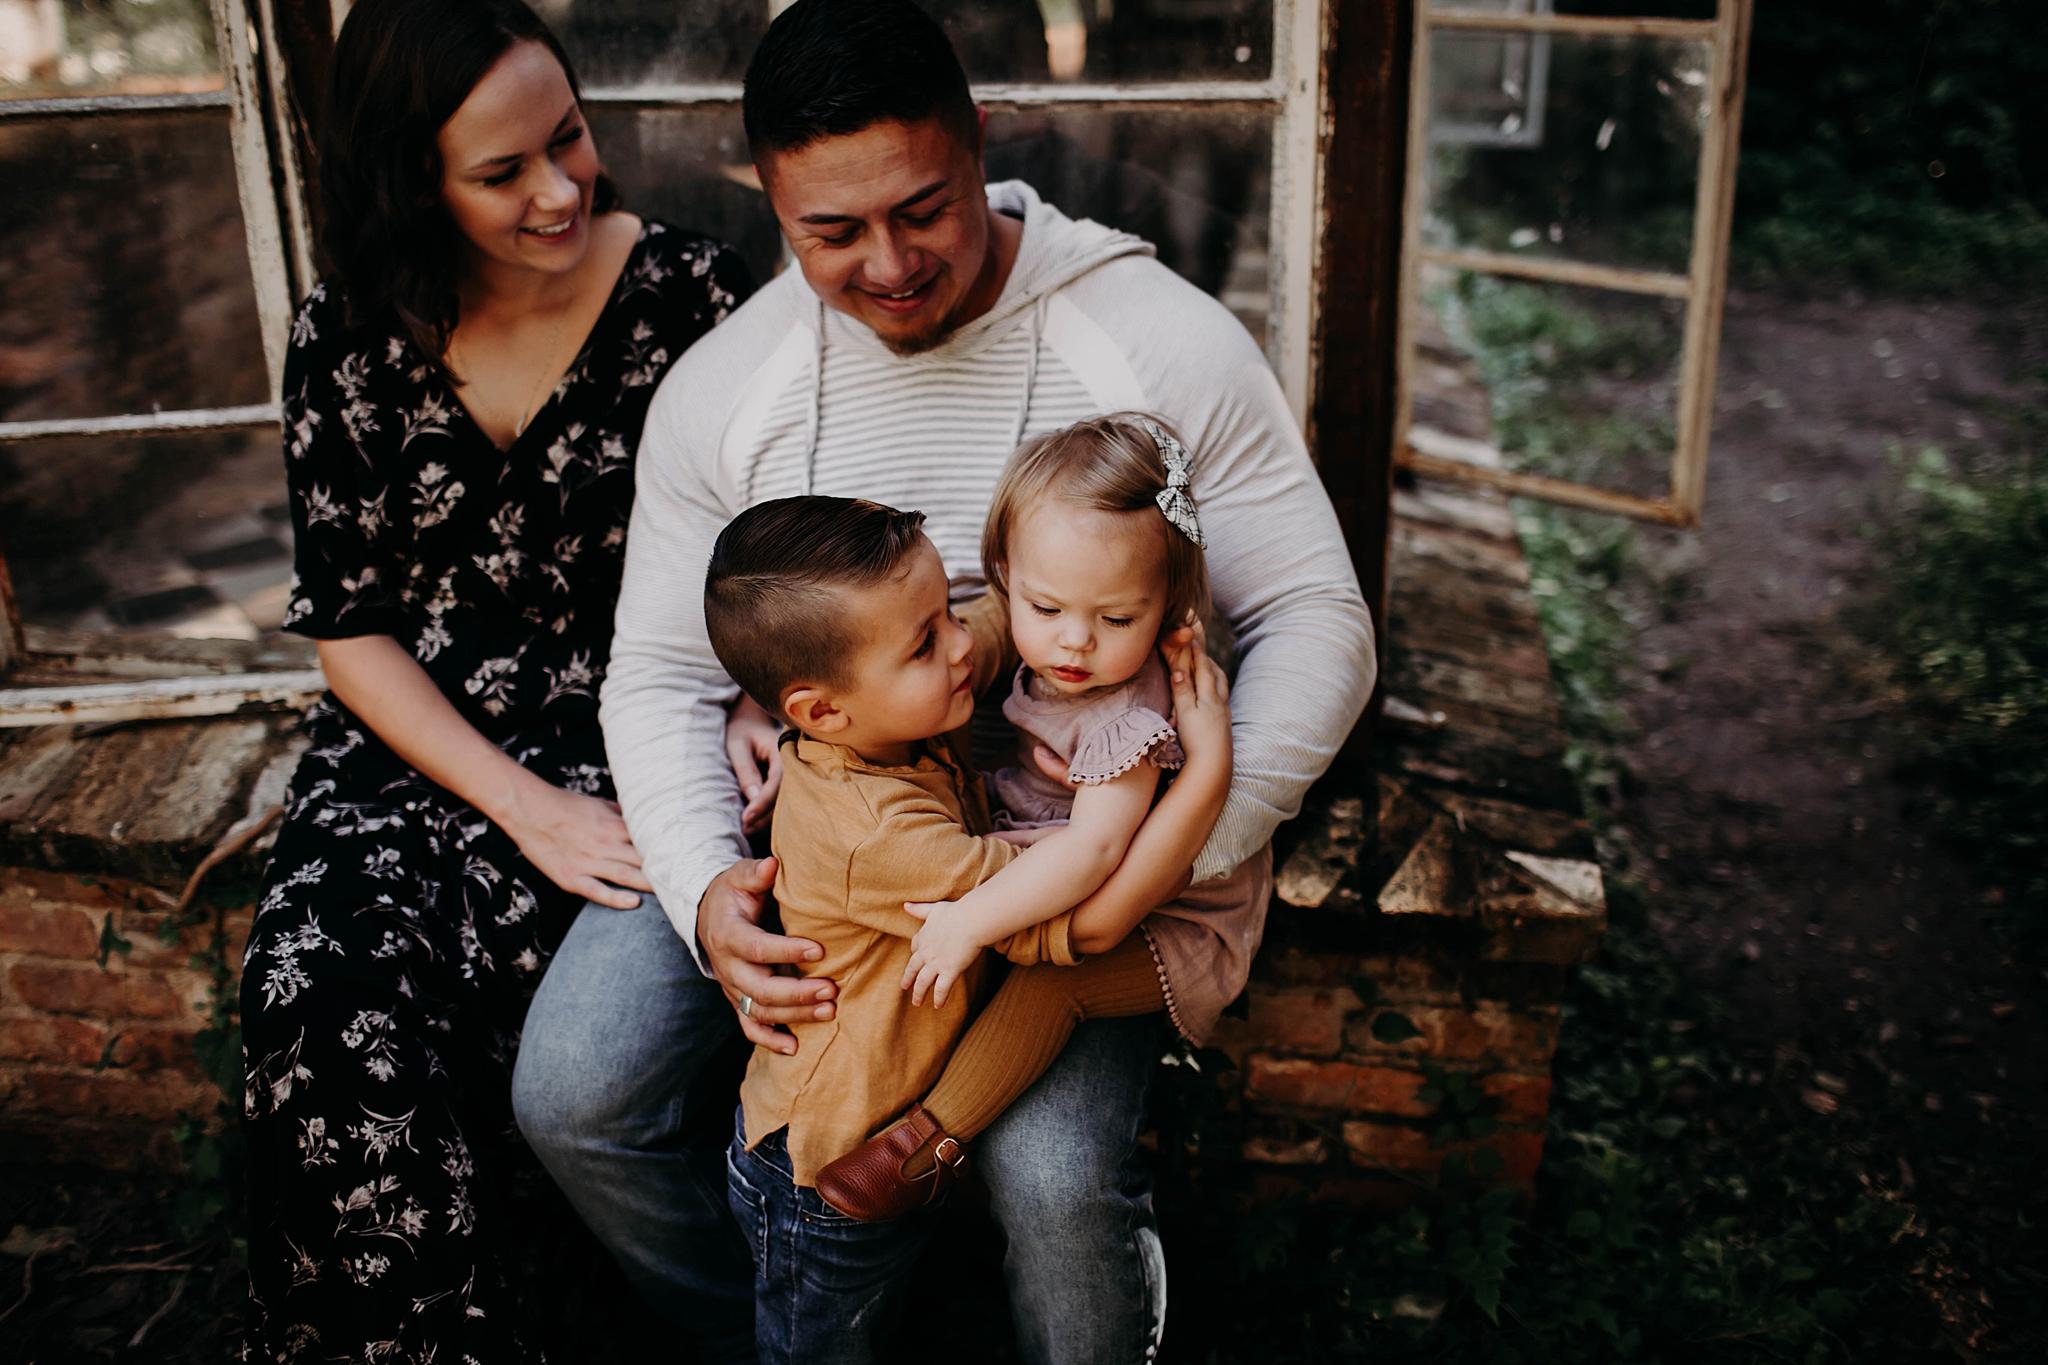 Luera-VMP-San-Antonio-Family-Photography-10_WEB.jpg